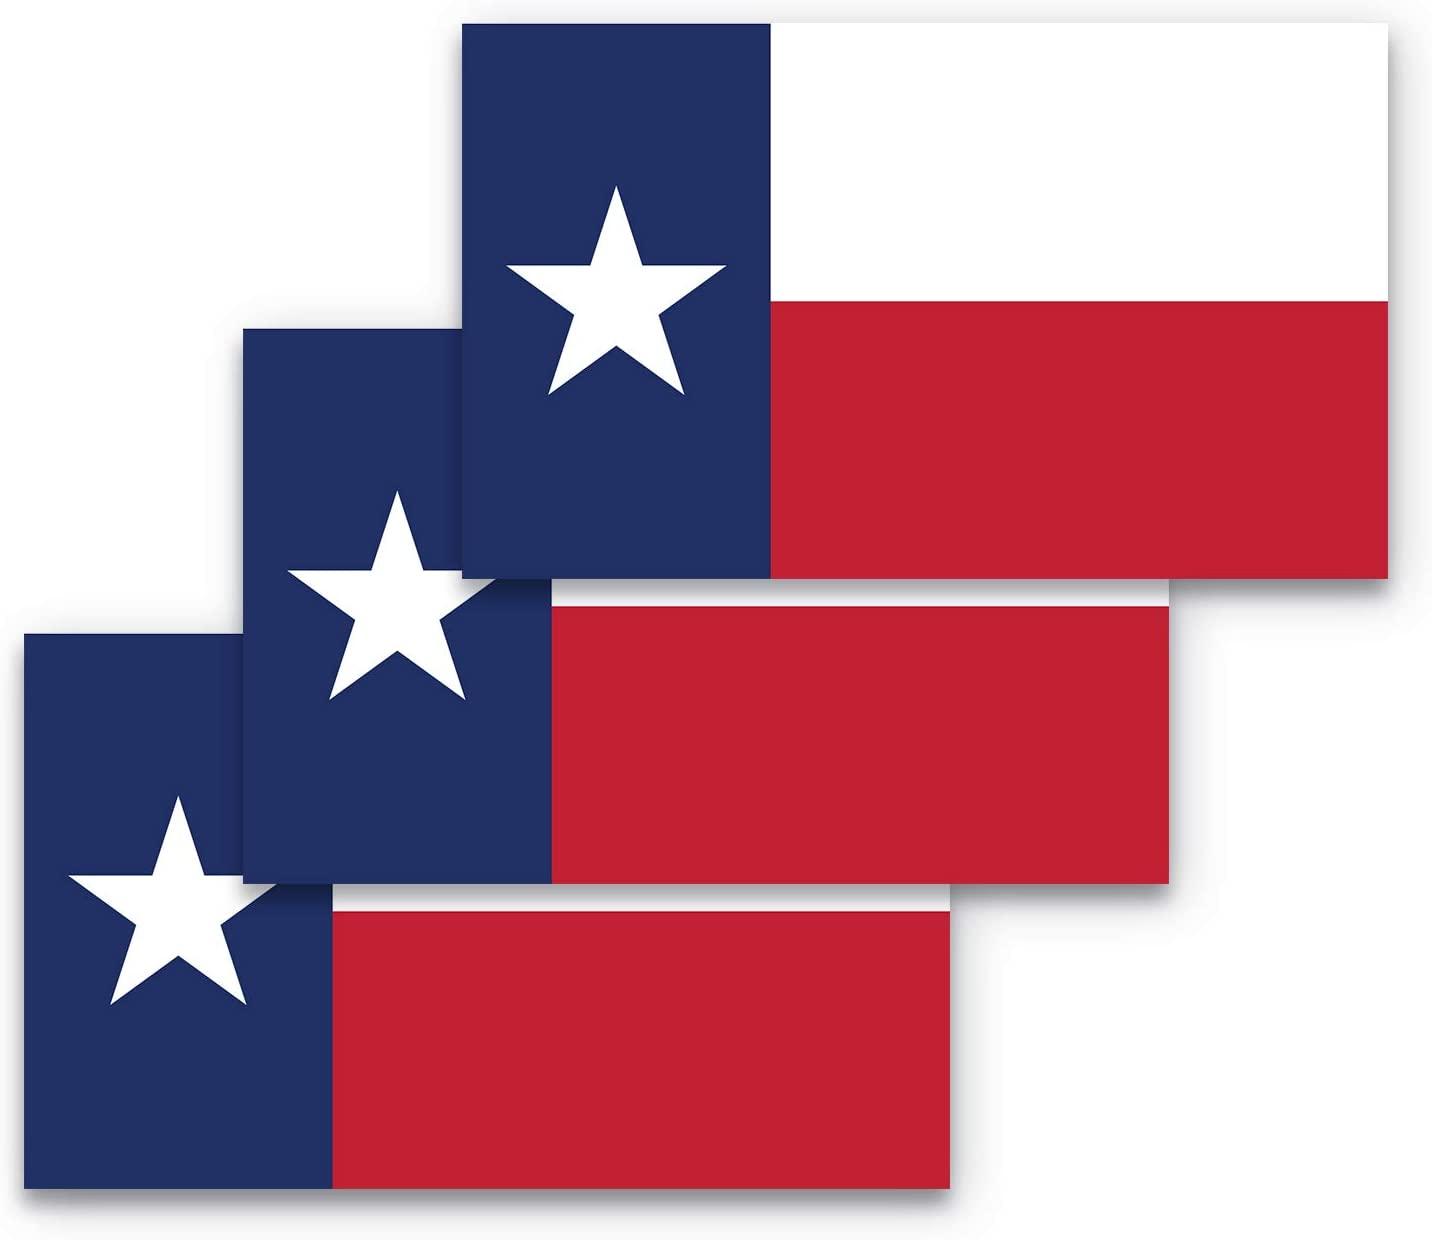 <span style=''>3X5 텍사스 스티커 3 팩 내구성 방수 재료 오래 지속되는 텍사스 플래그 스티커 텍사스 ..</span>